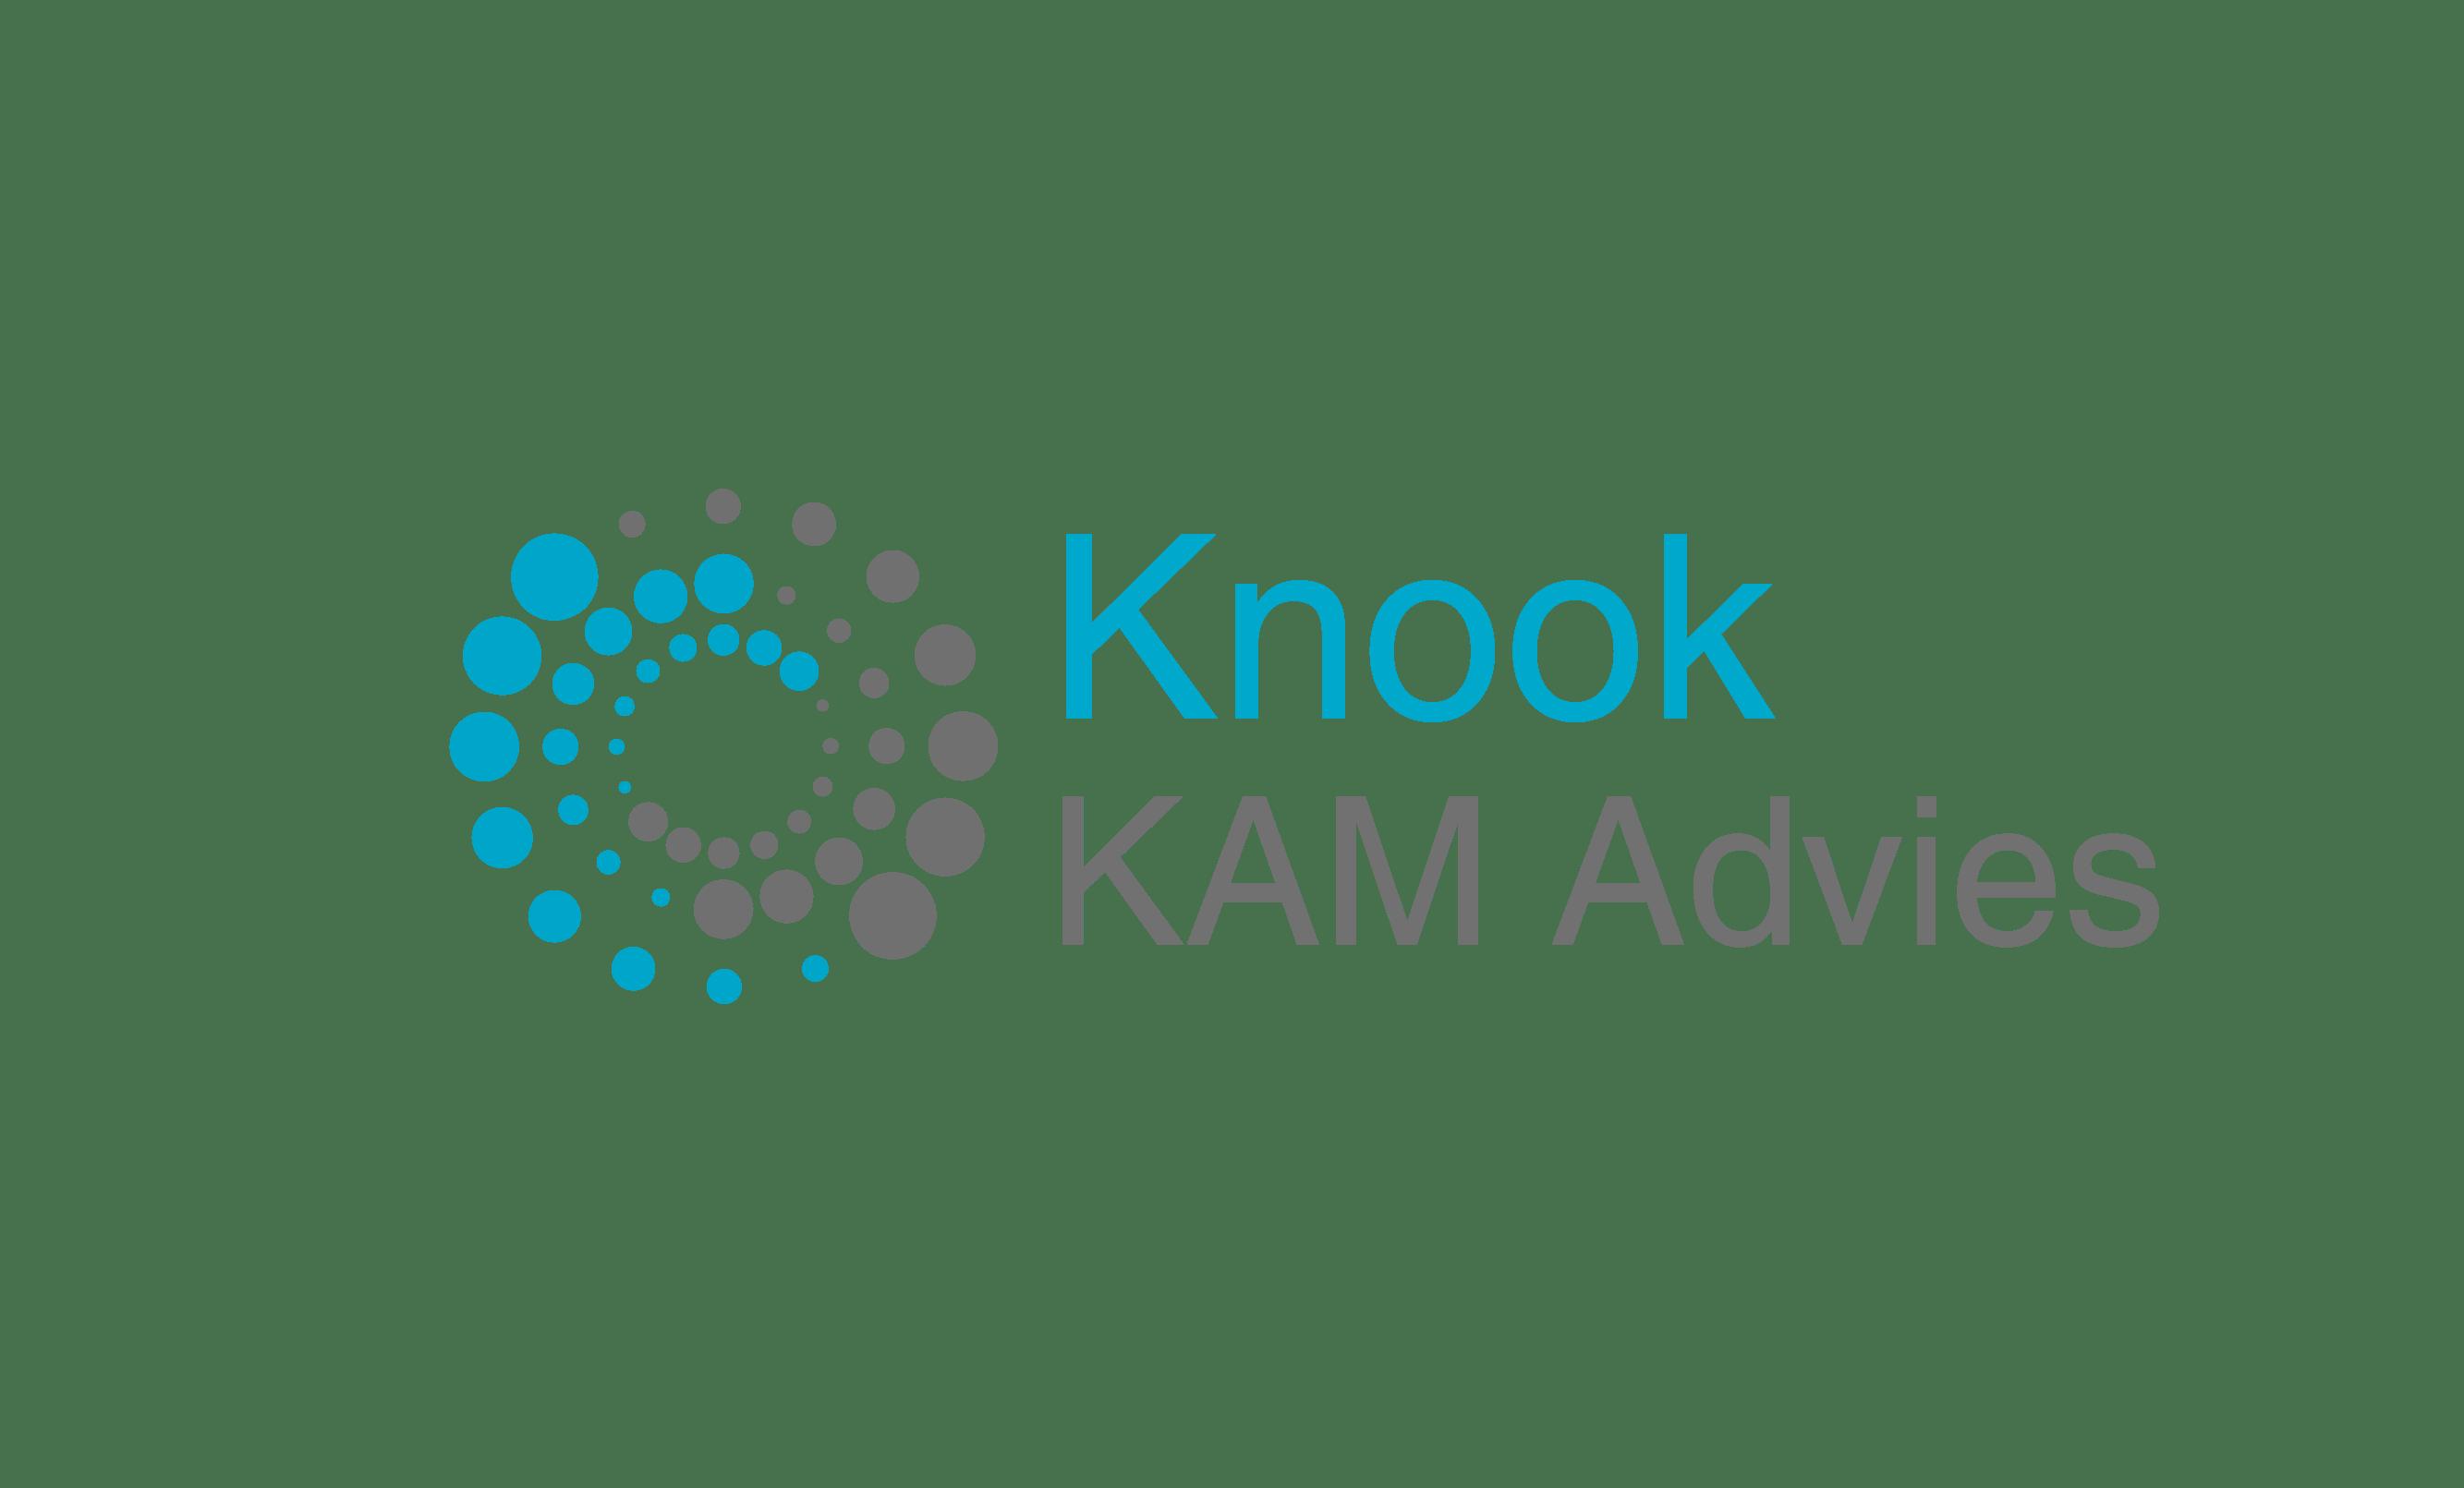 Knook KAM Advies